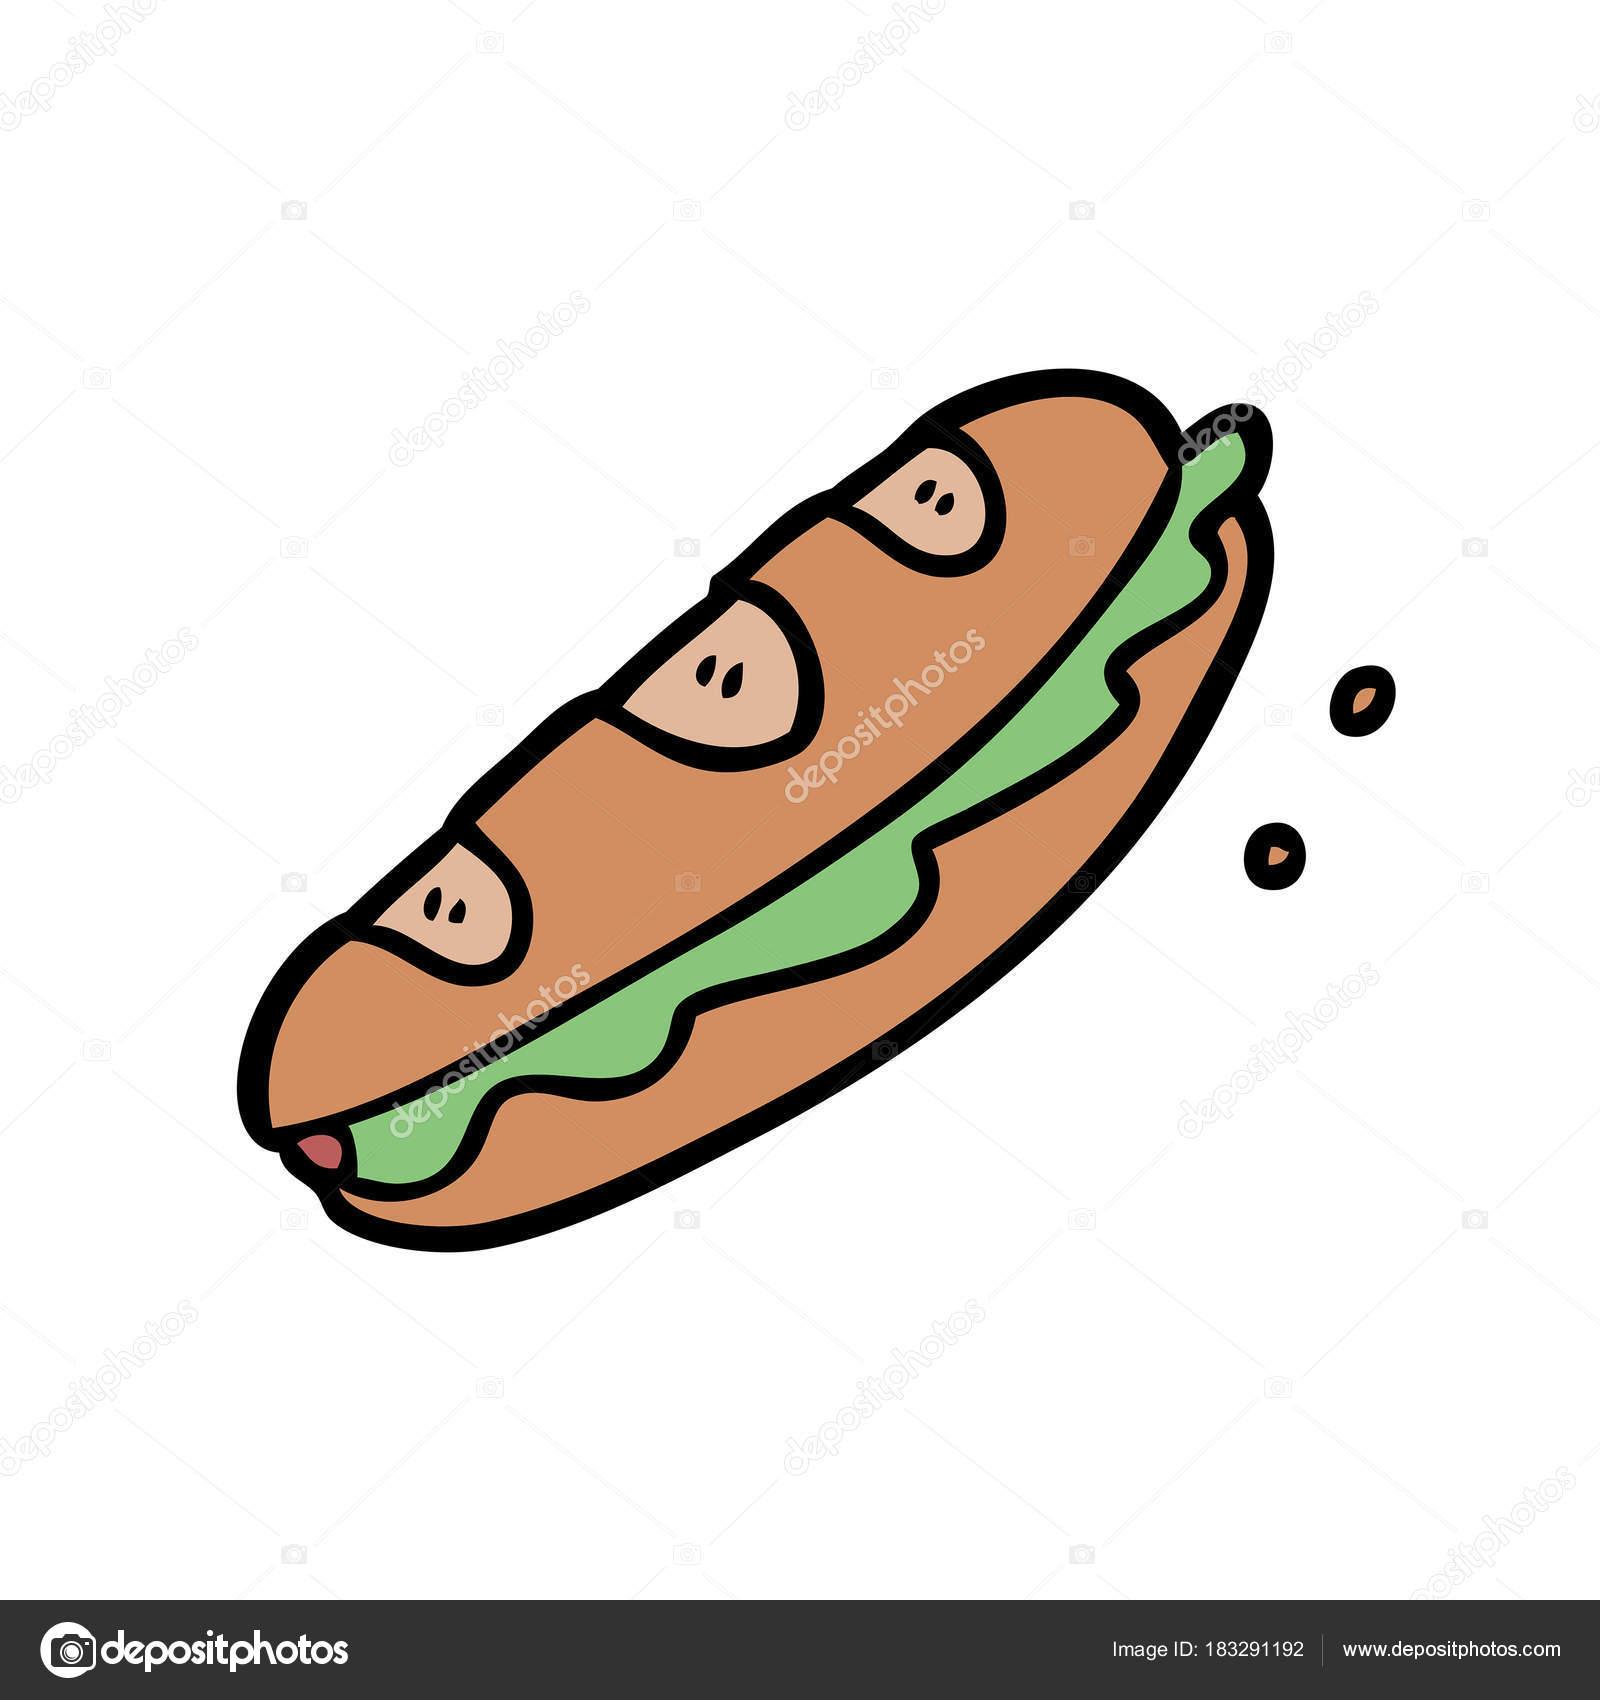 vector illustration sandwich cartoon character stock vector c lineartestpilot 183291192 vector illustration sandwich cartoon character stock vector c lineartestpilot 183291192